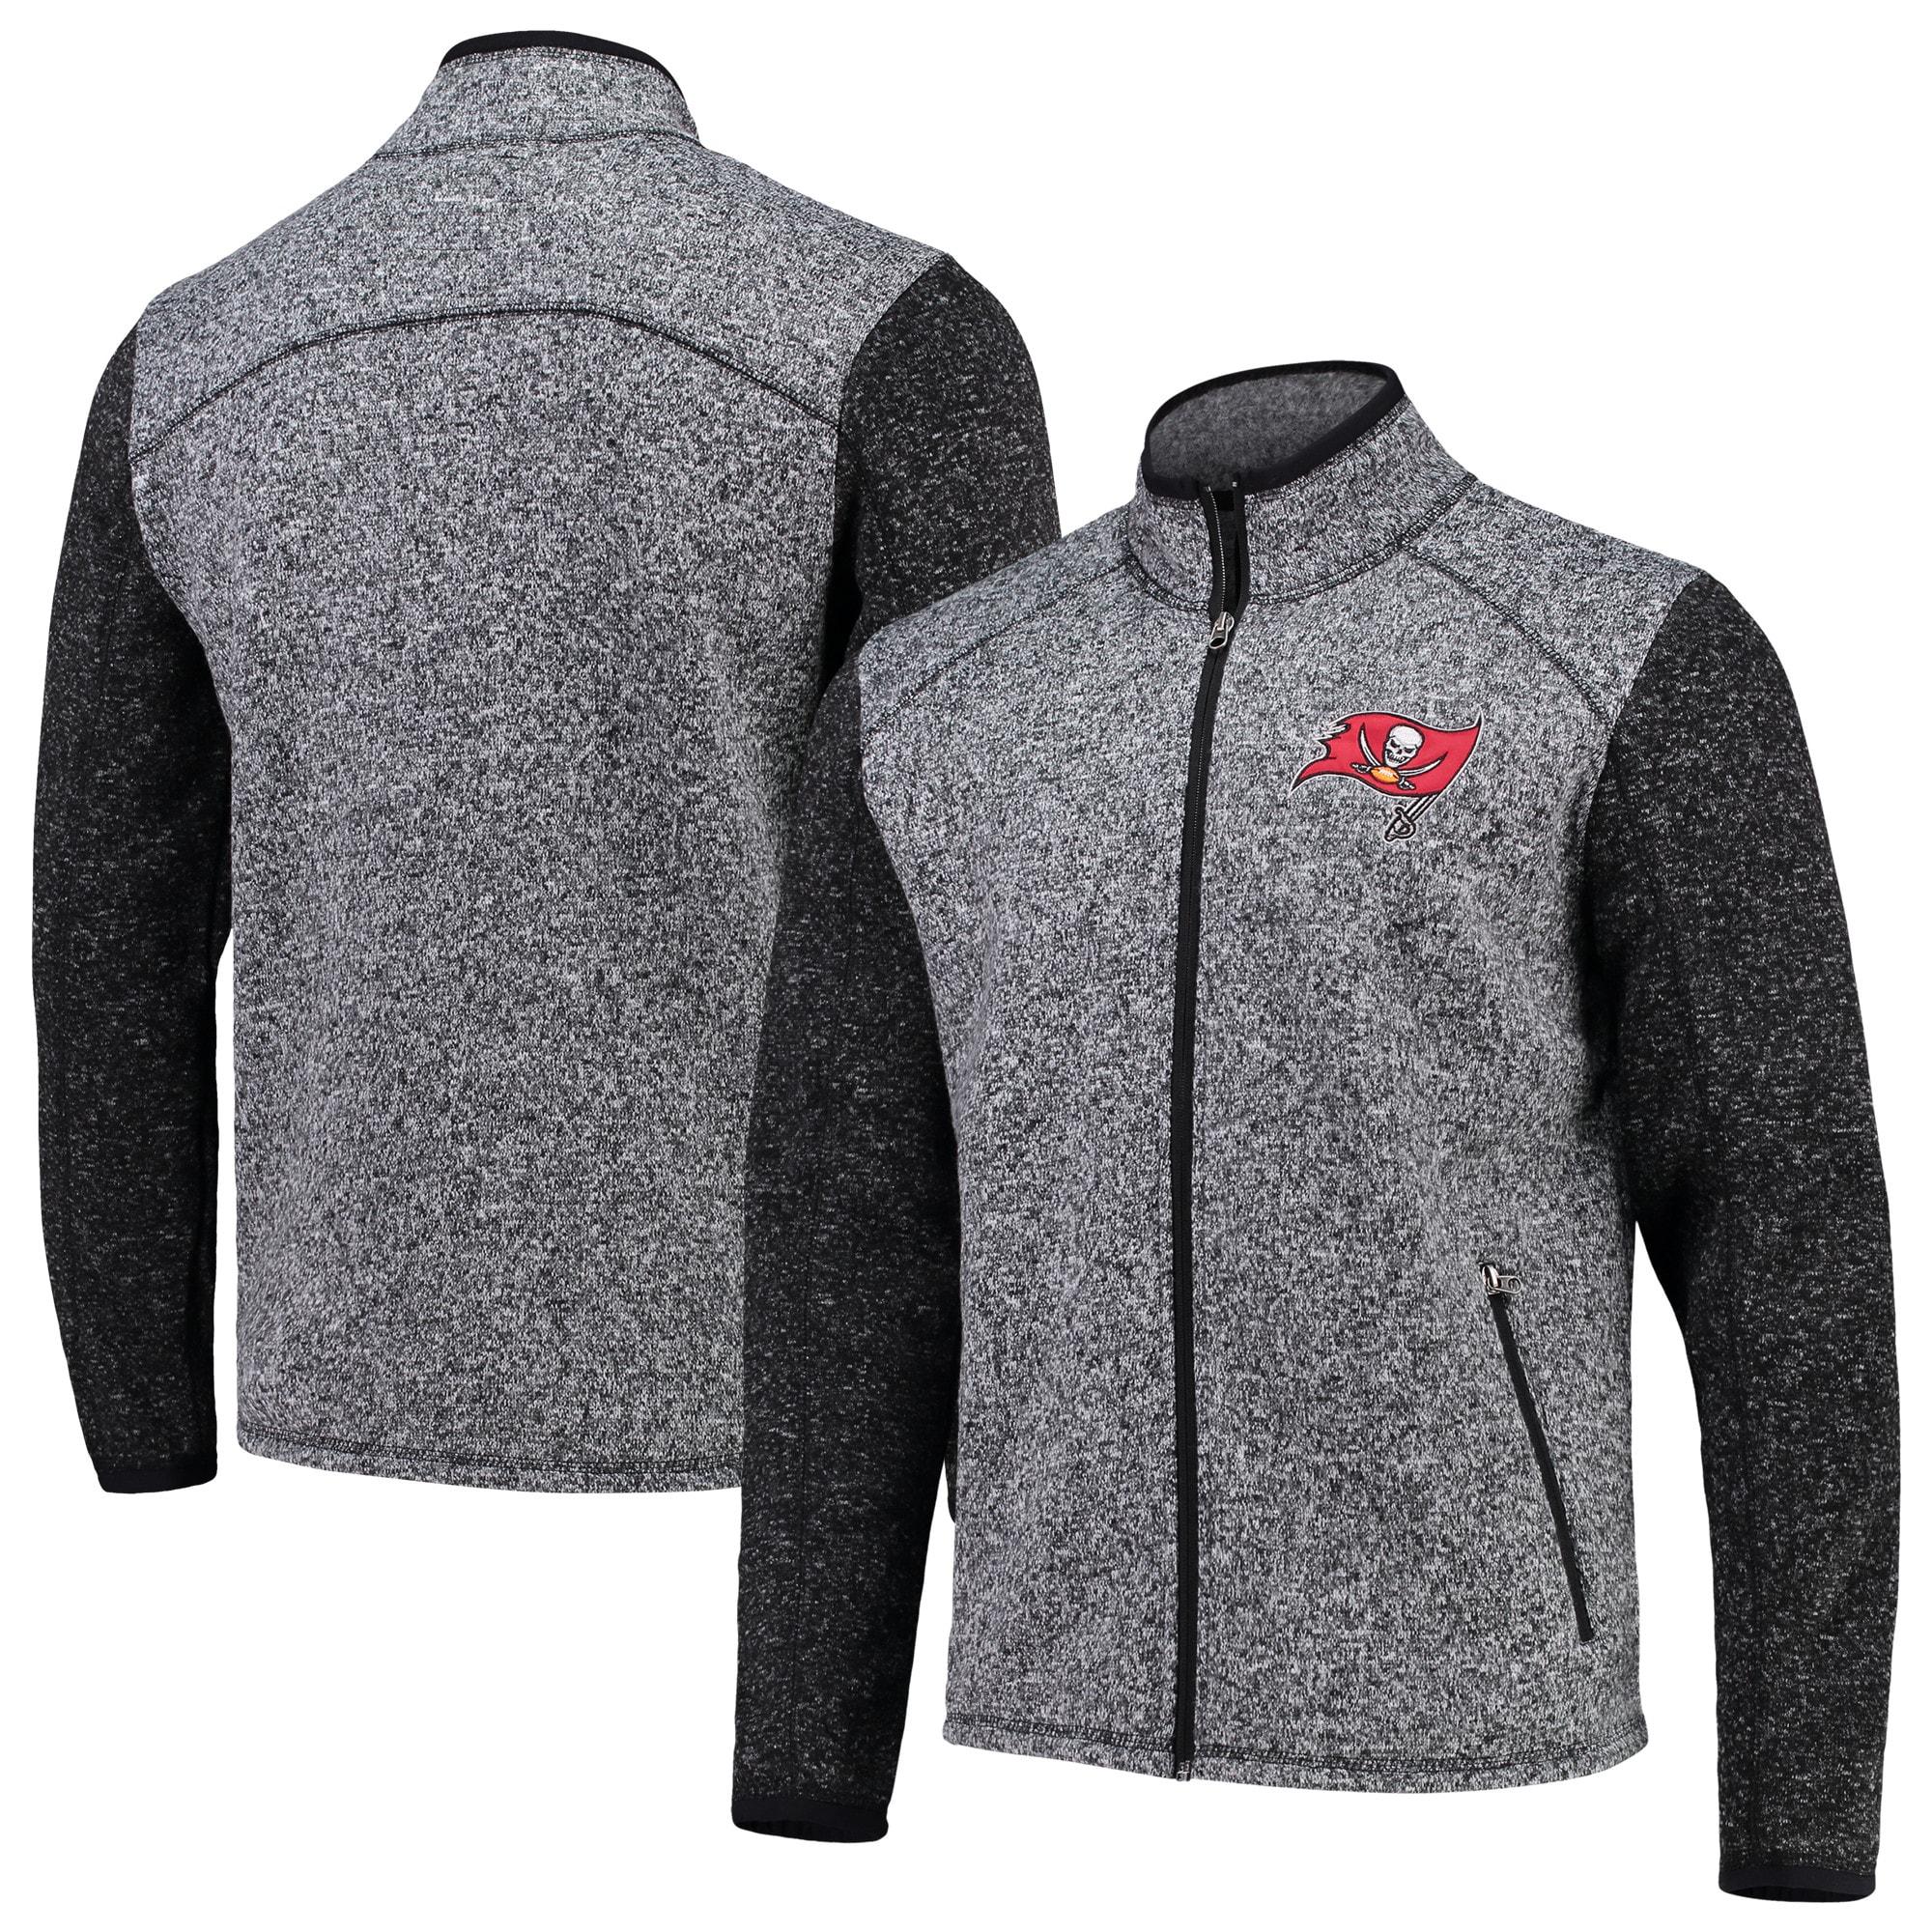 Tampa Bay Buccaneers G-III Sports by Carl Banks Alpine Zone Sweater Fleece Full-Zip Jacket - Heathered Charcoal